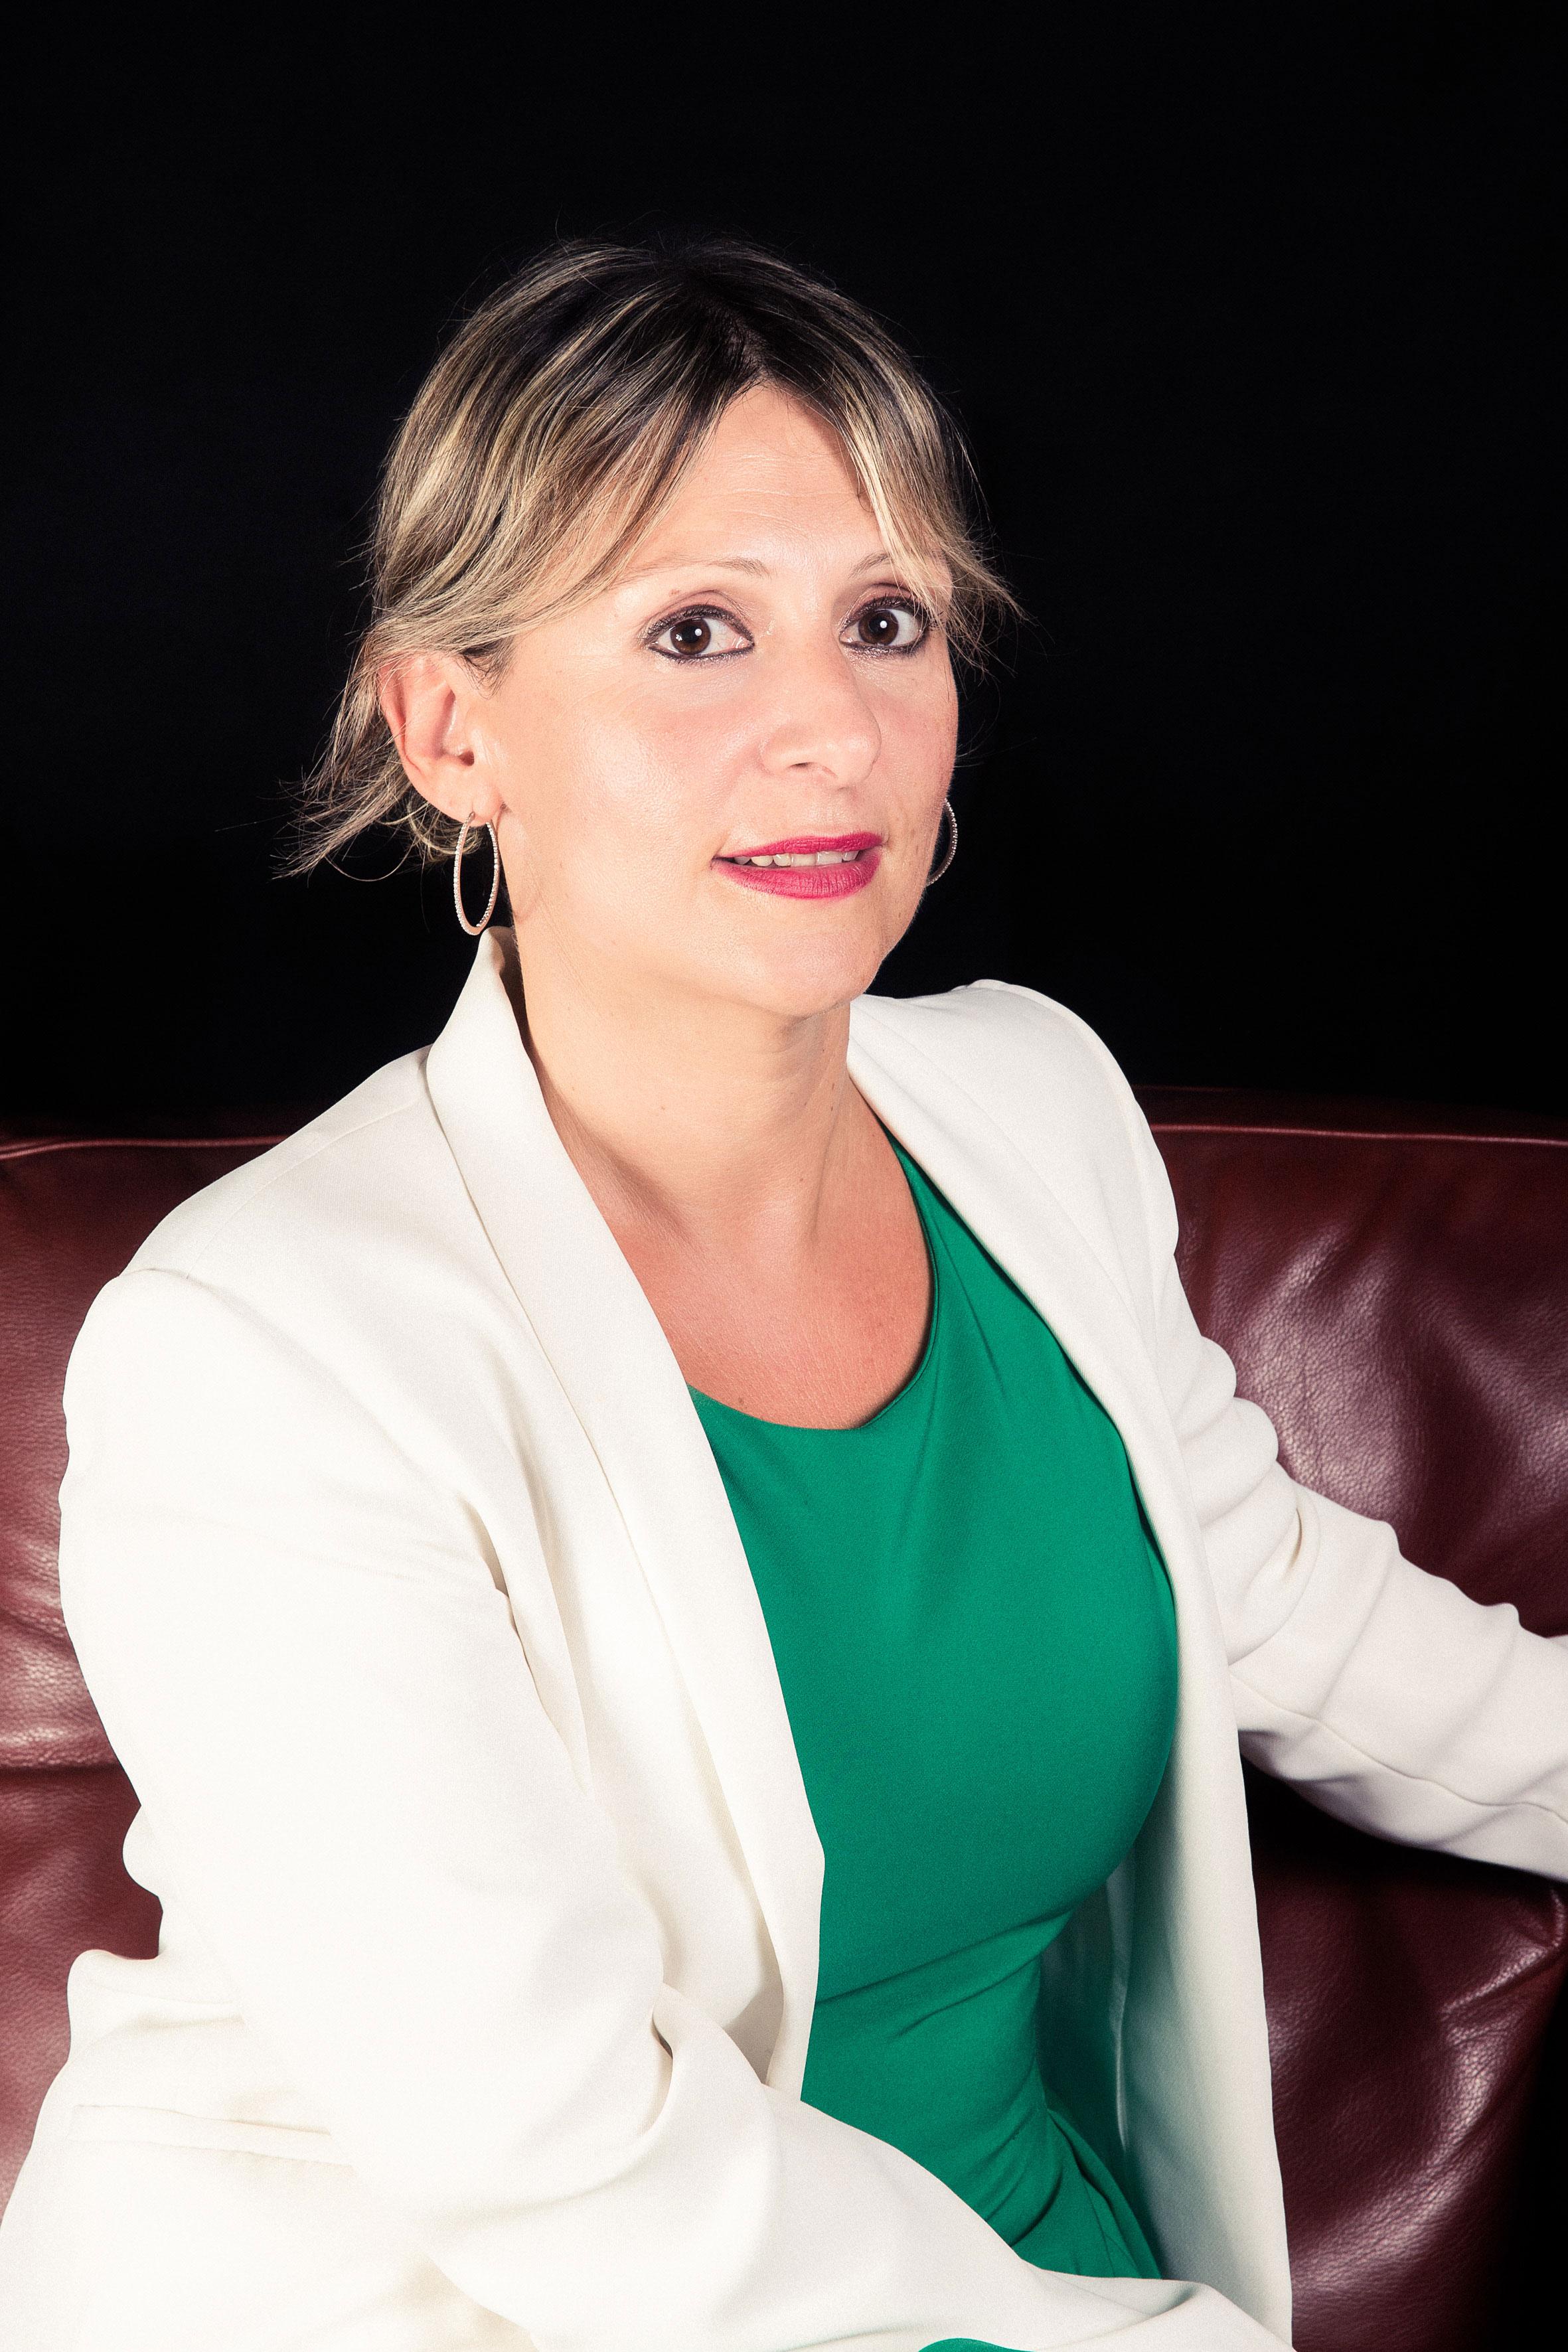 Laura Spatola